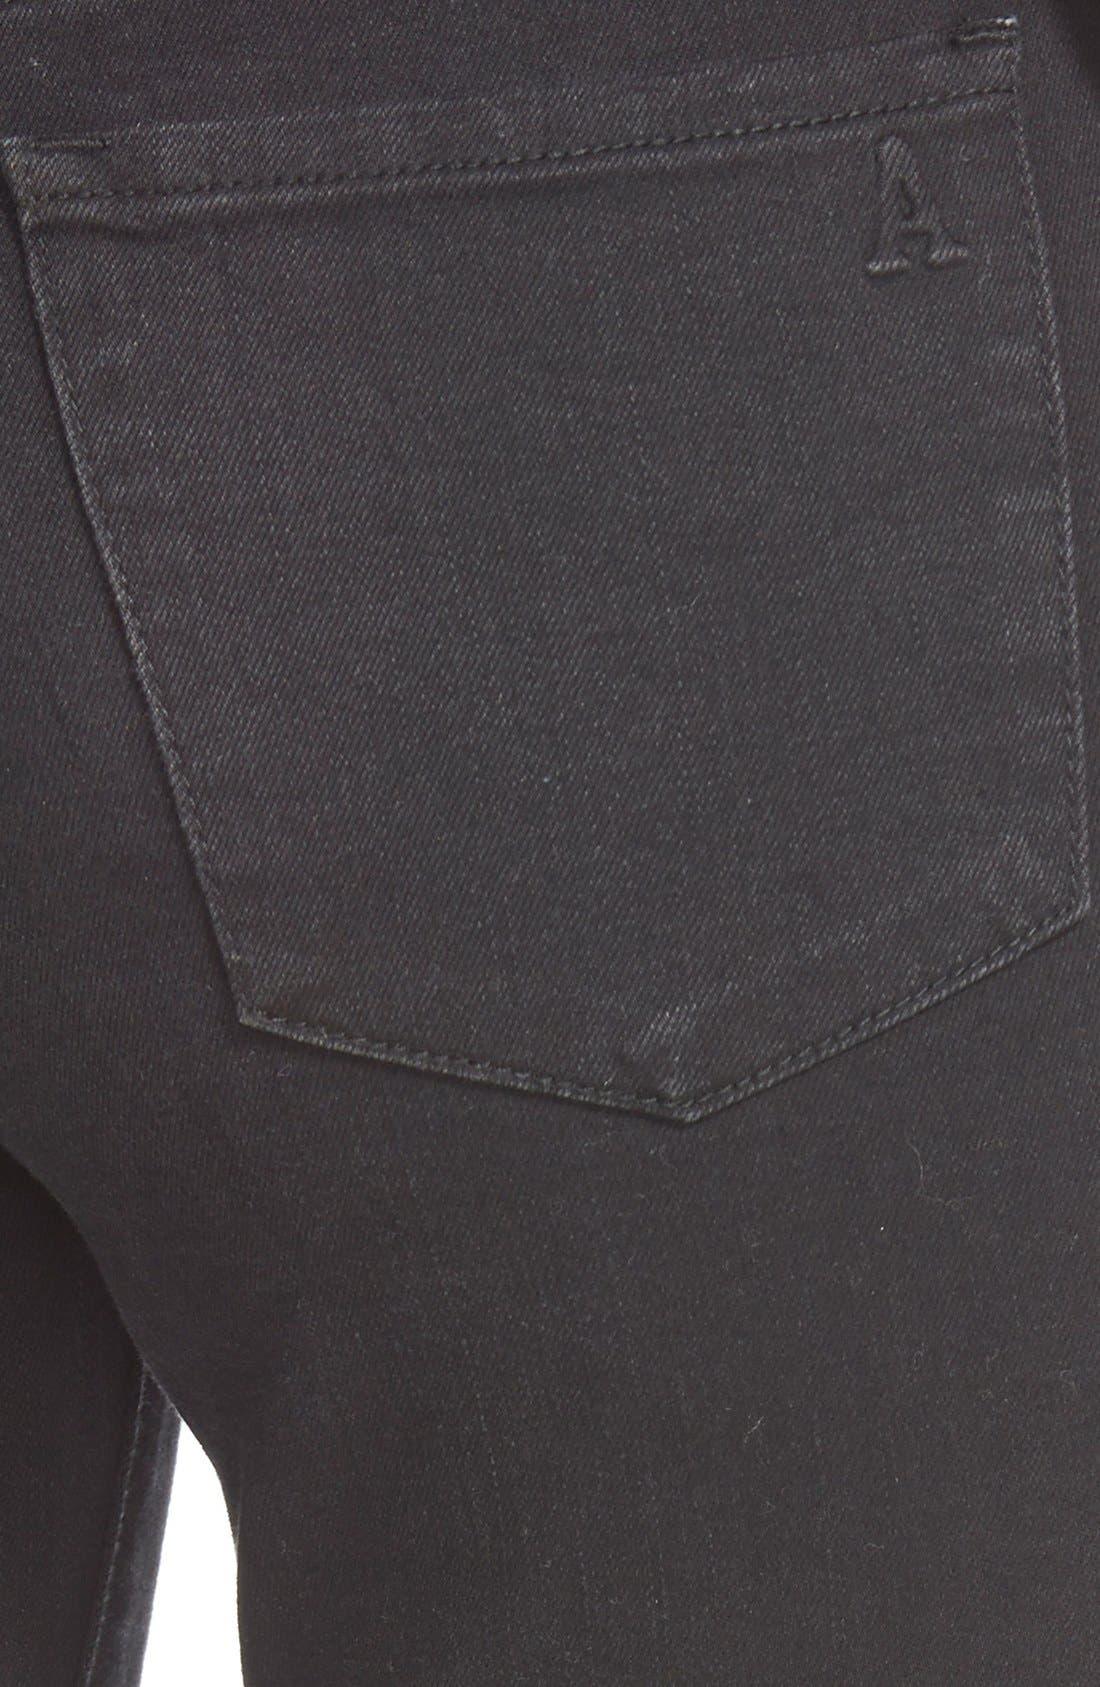 'Sarah' Distressed Skinny Jeans,                             Alternate thumbnail 2, color,                             006